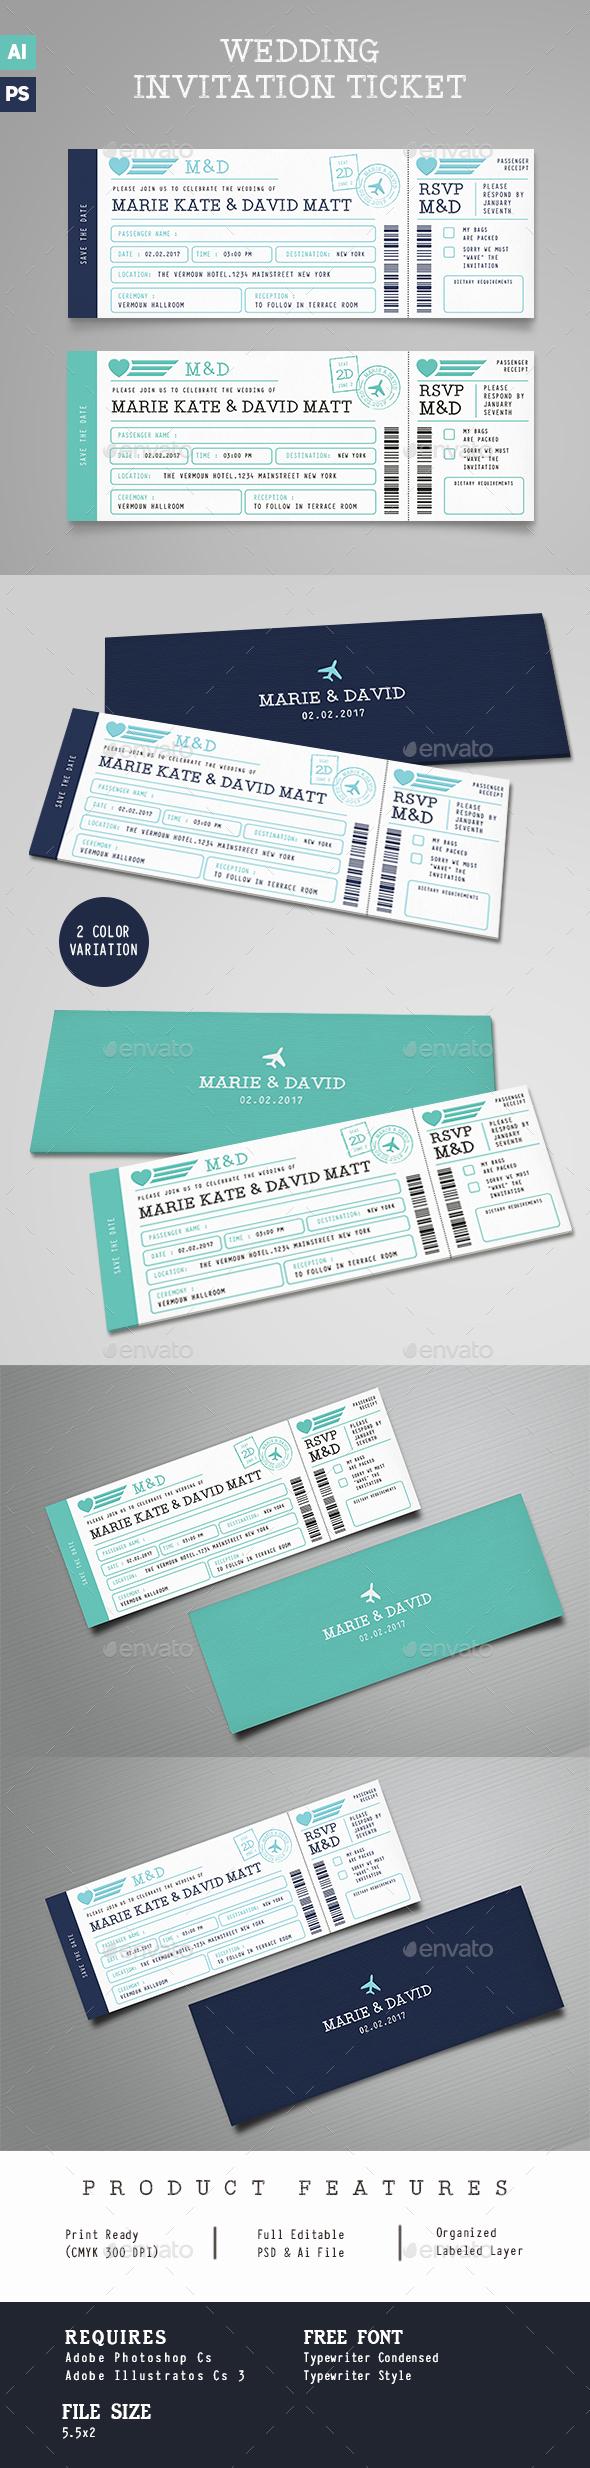 Boarding Pass Wedding Invitation Ticket - Wedding Greeting Cards